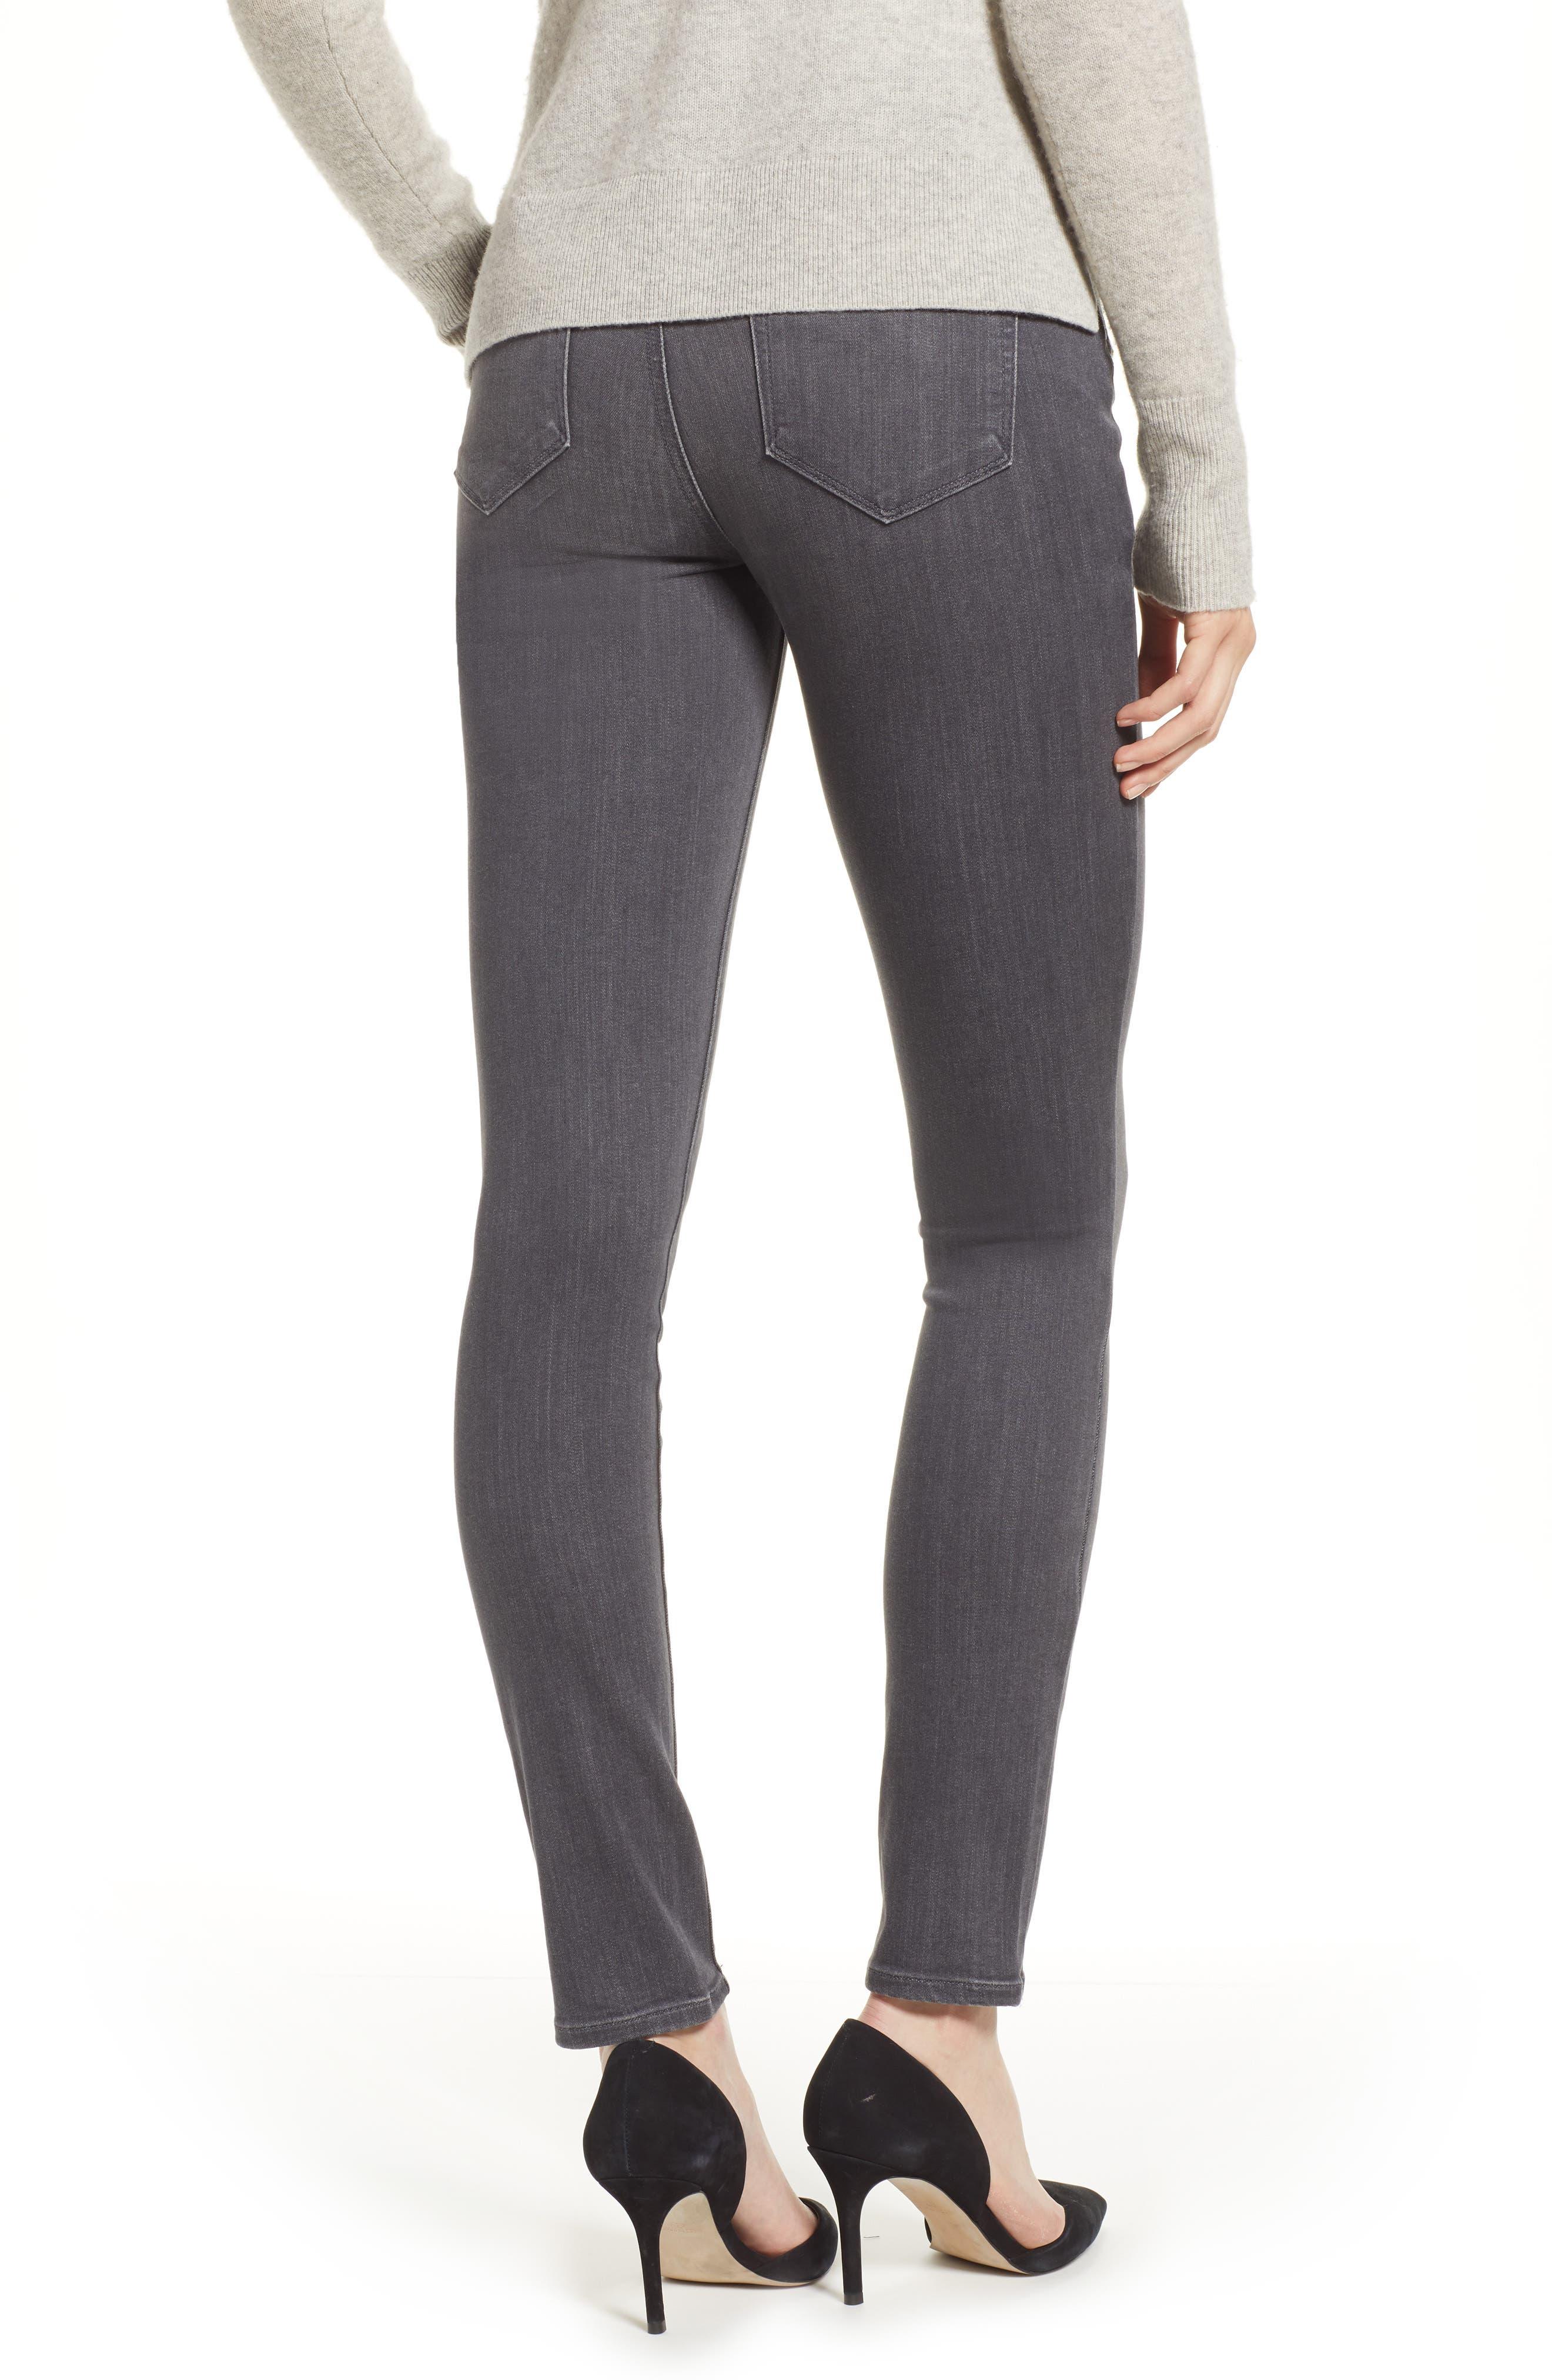 Transcend - Verdugo Maternity Skinny Jeans,                             Alternate thumbnail 2, color,                             GREY PEAKS